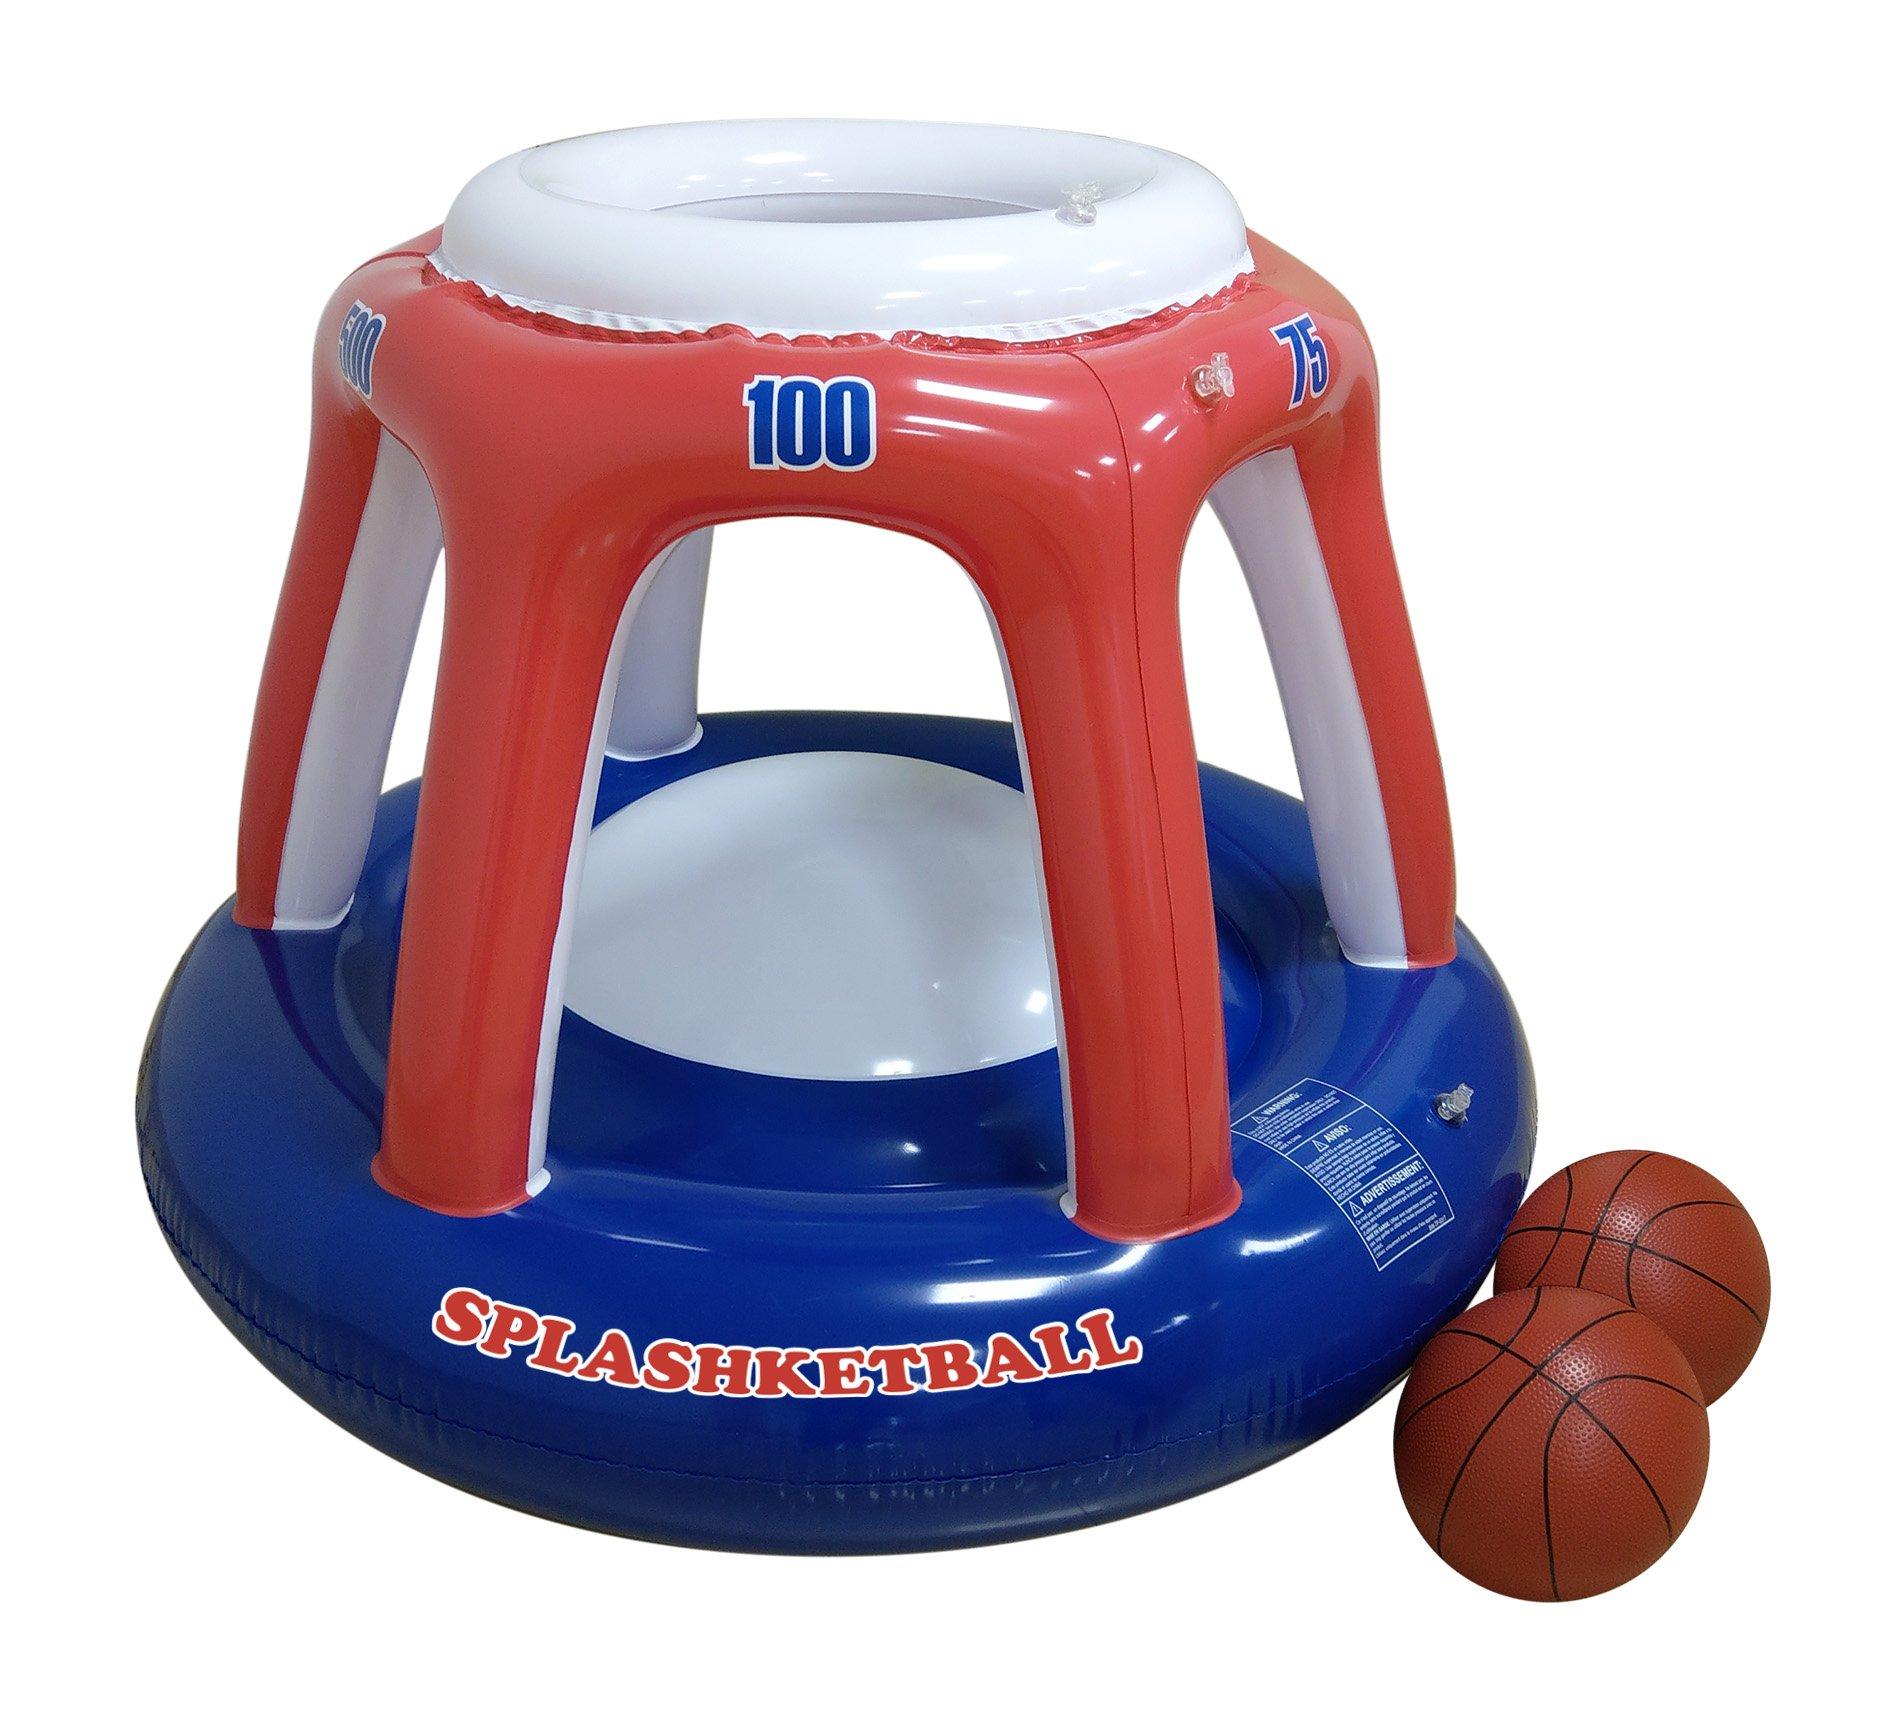 RhinoMaster Play Splashketball Basketball Pool Toy, Orange, Blue, 45'' L x 36'' W by RhinoMaster Play (Image #1)